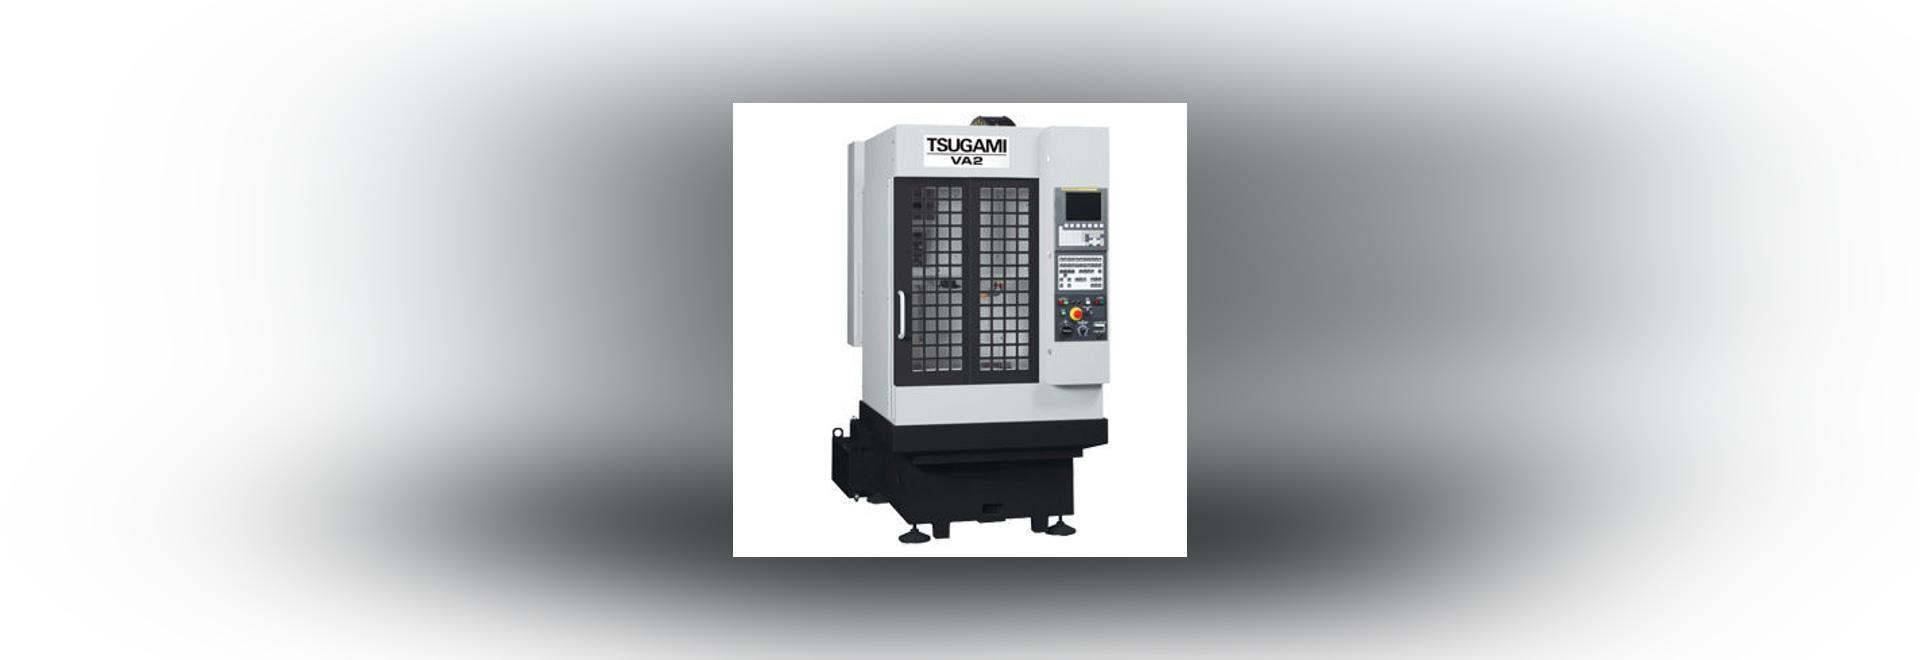 NEW: CNC machining center by Tsugami